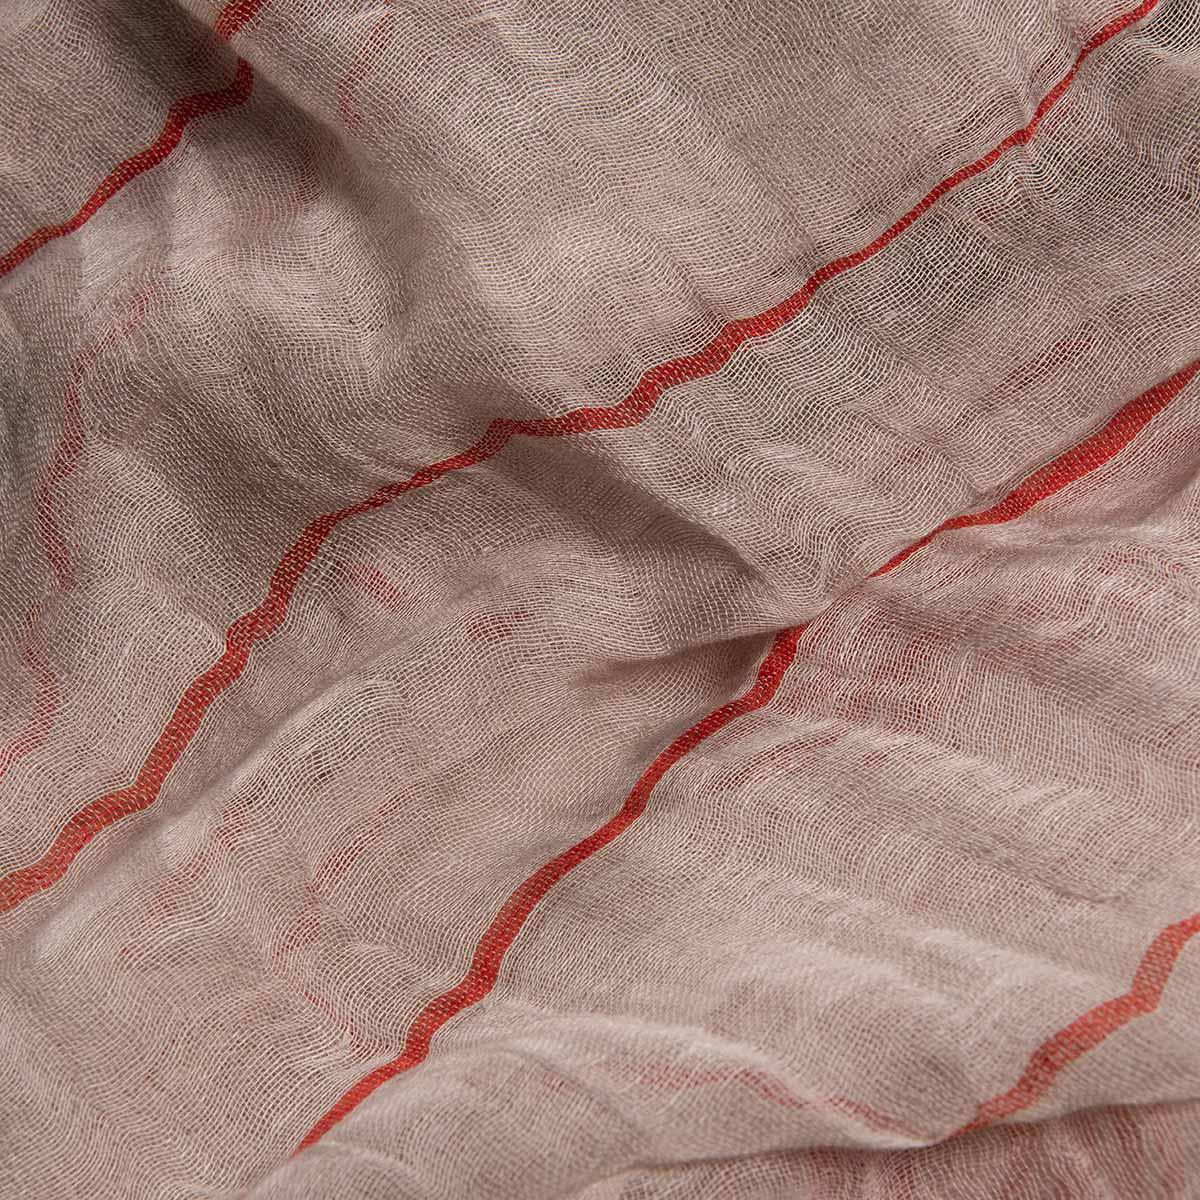 Peshtemal / Pareo Toprak - Red Stripes